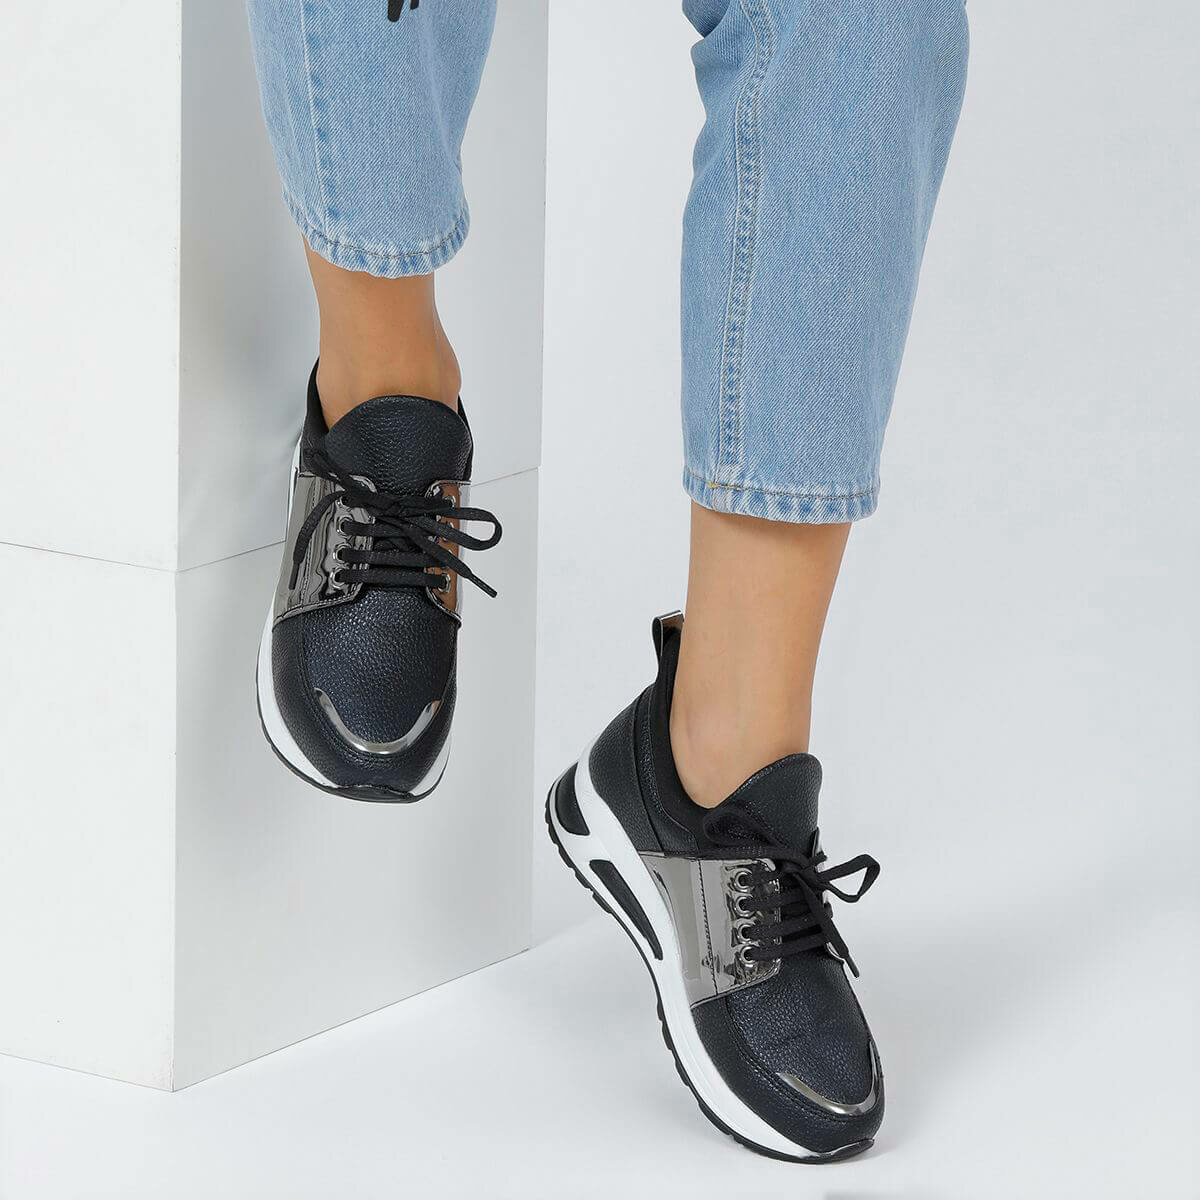 FLO BEYOND85Z SKIN Black Women Shoes BUTIGO